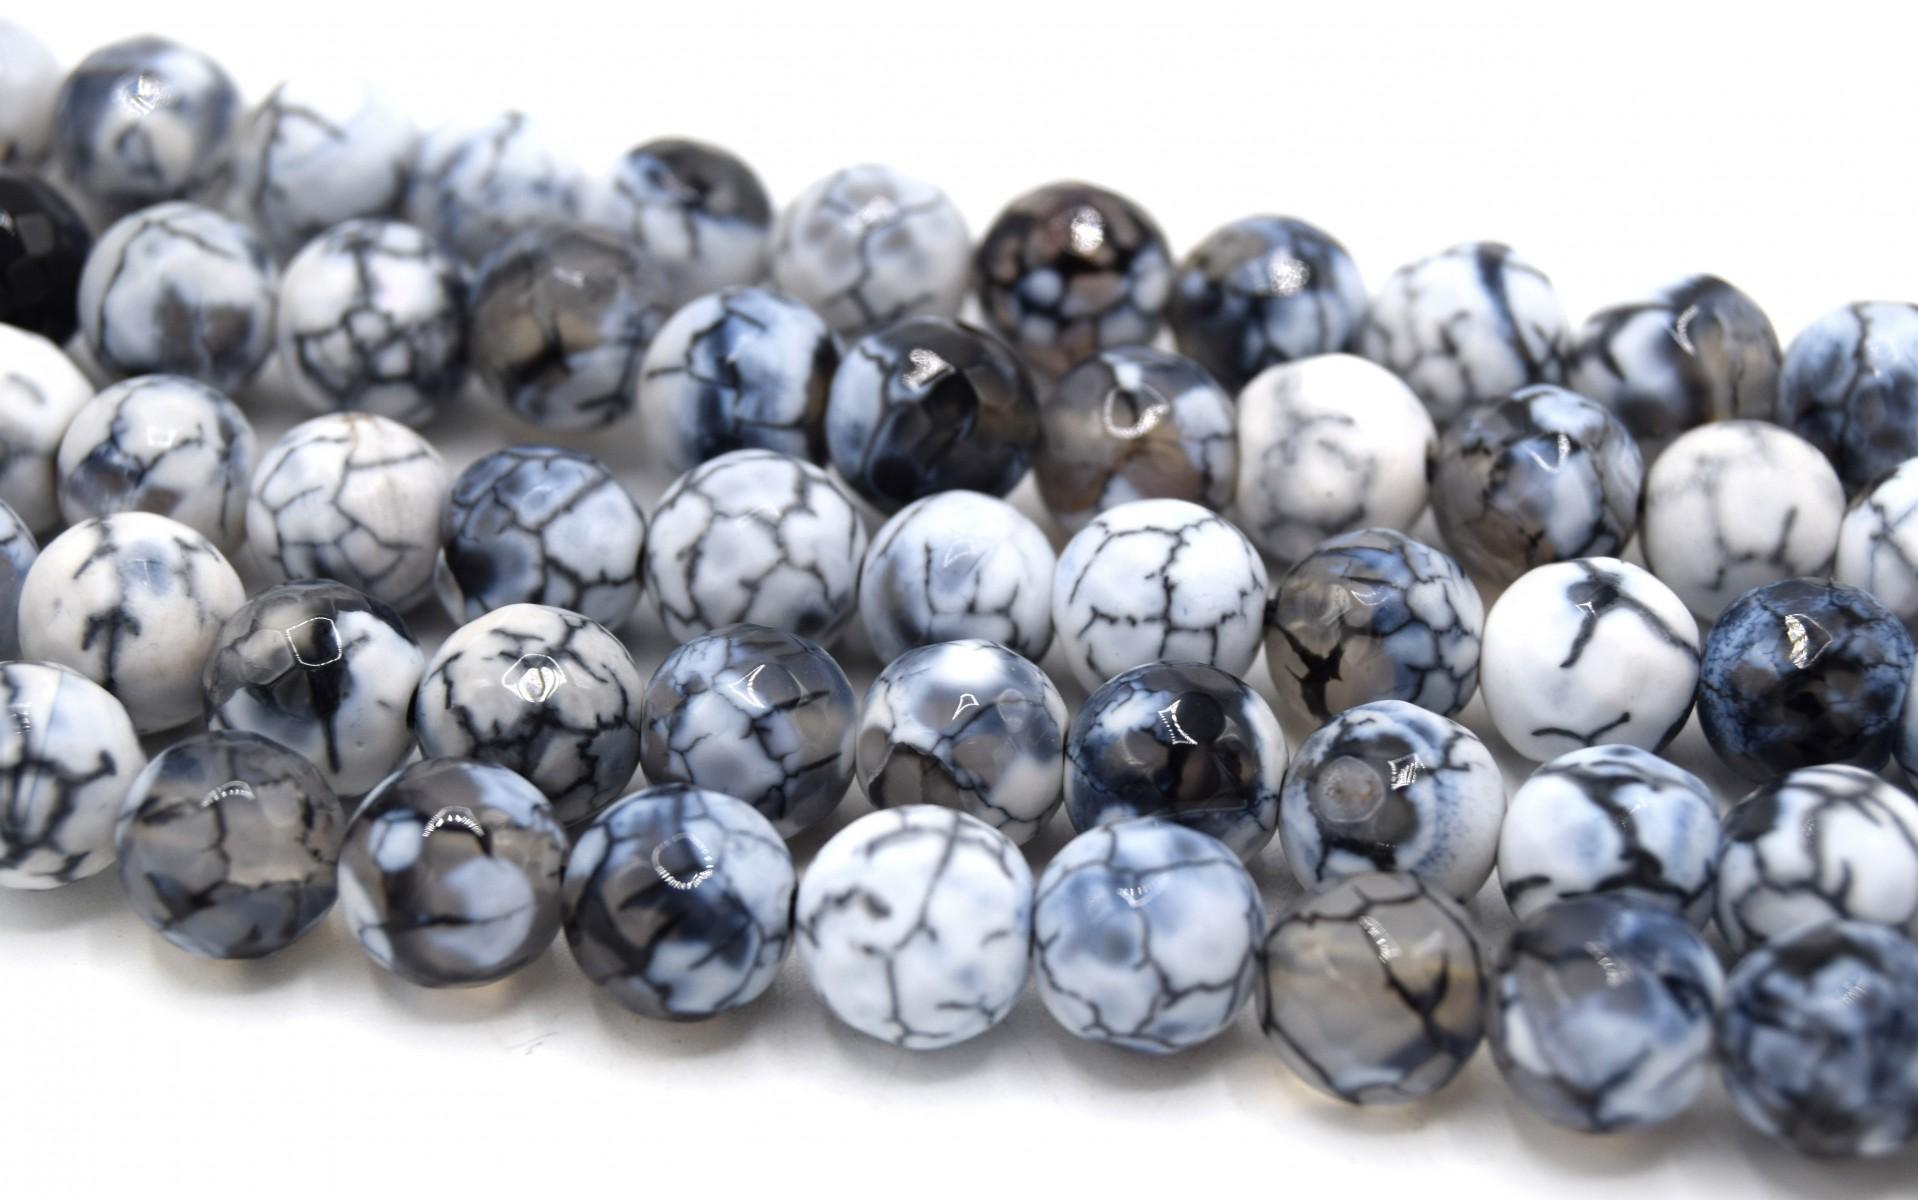 Agate blanche perles ovale env 7 x 9mm-7 x 12 mm mèche de 30+